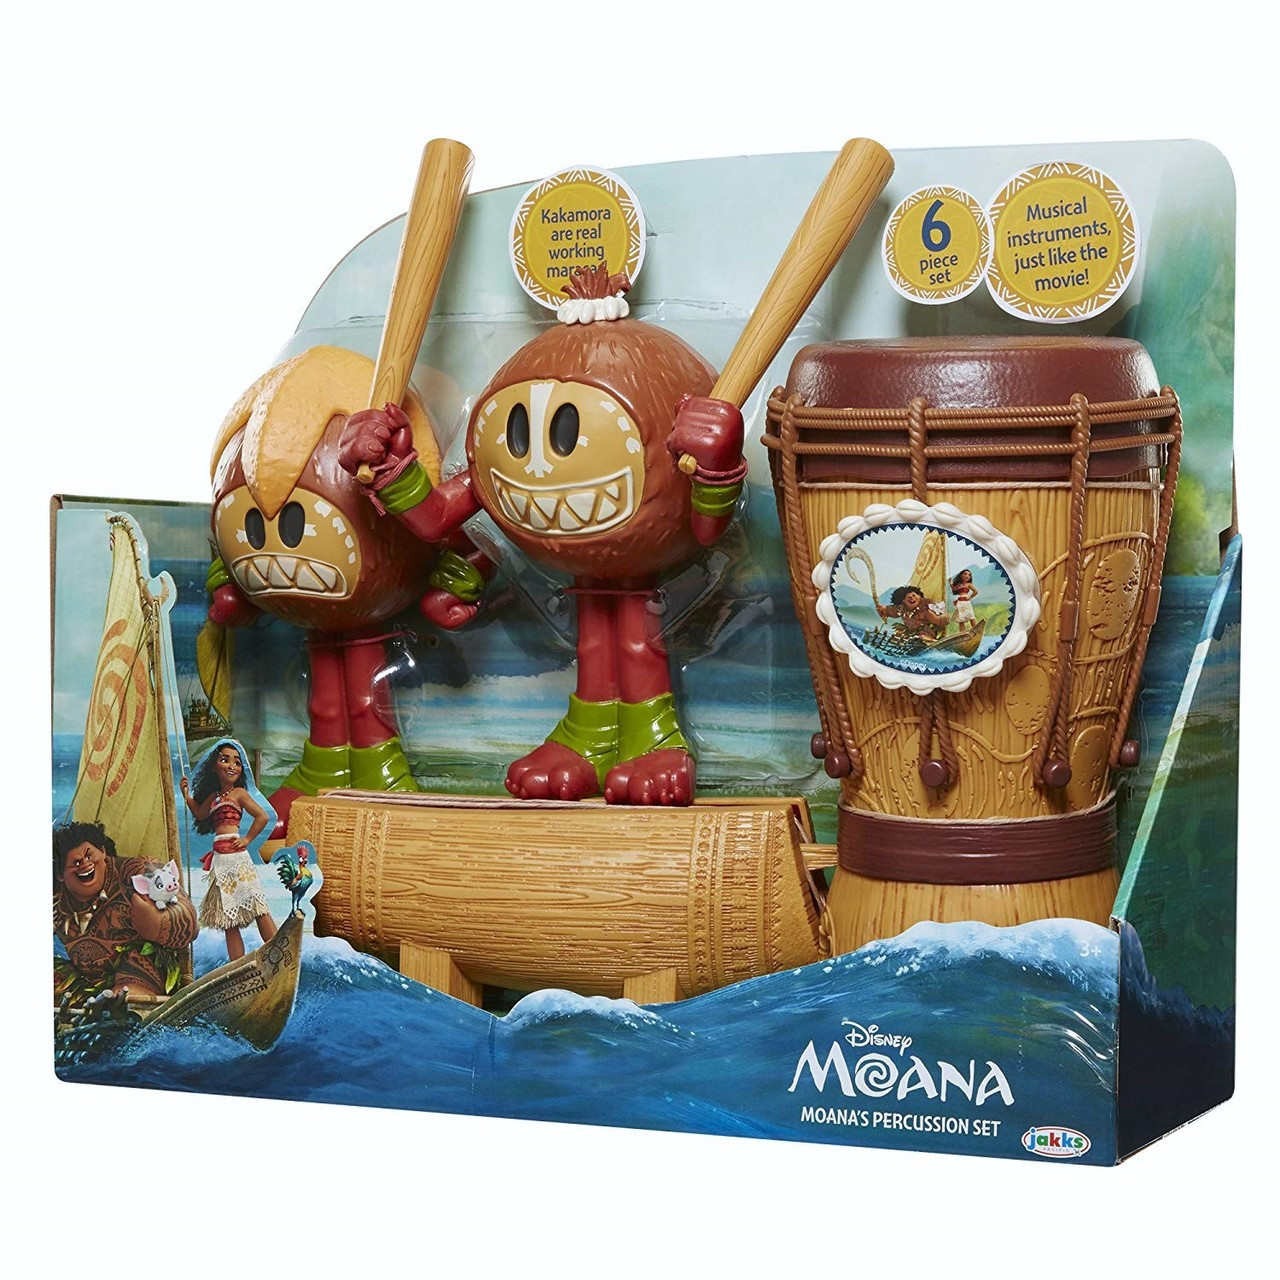 Moana Percussion Set